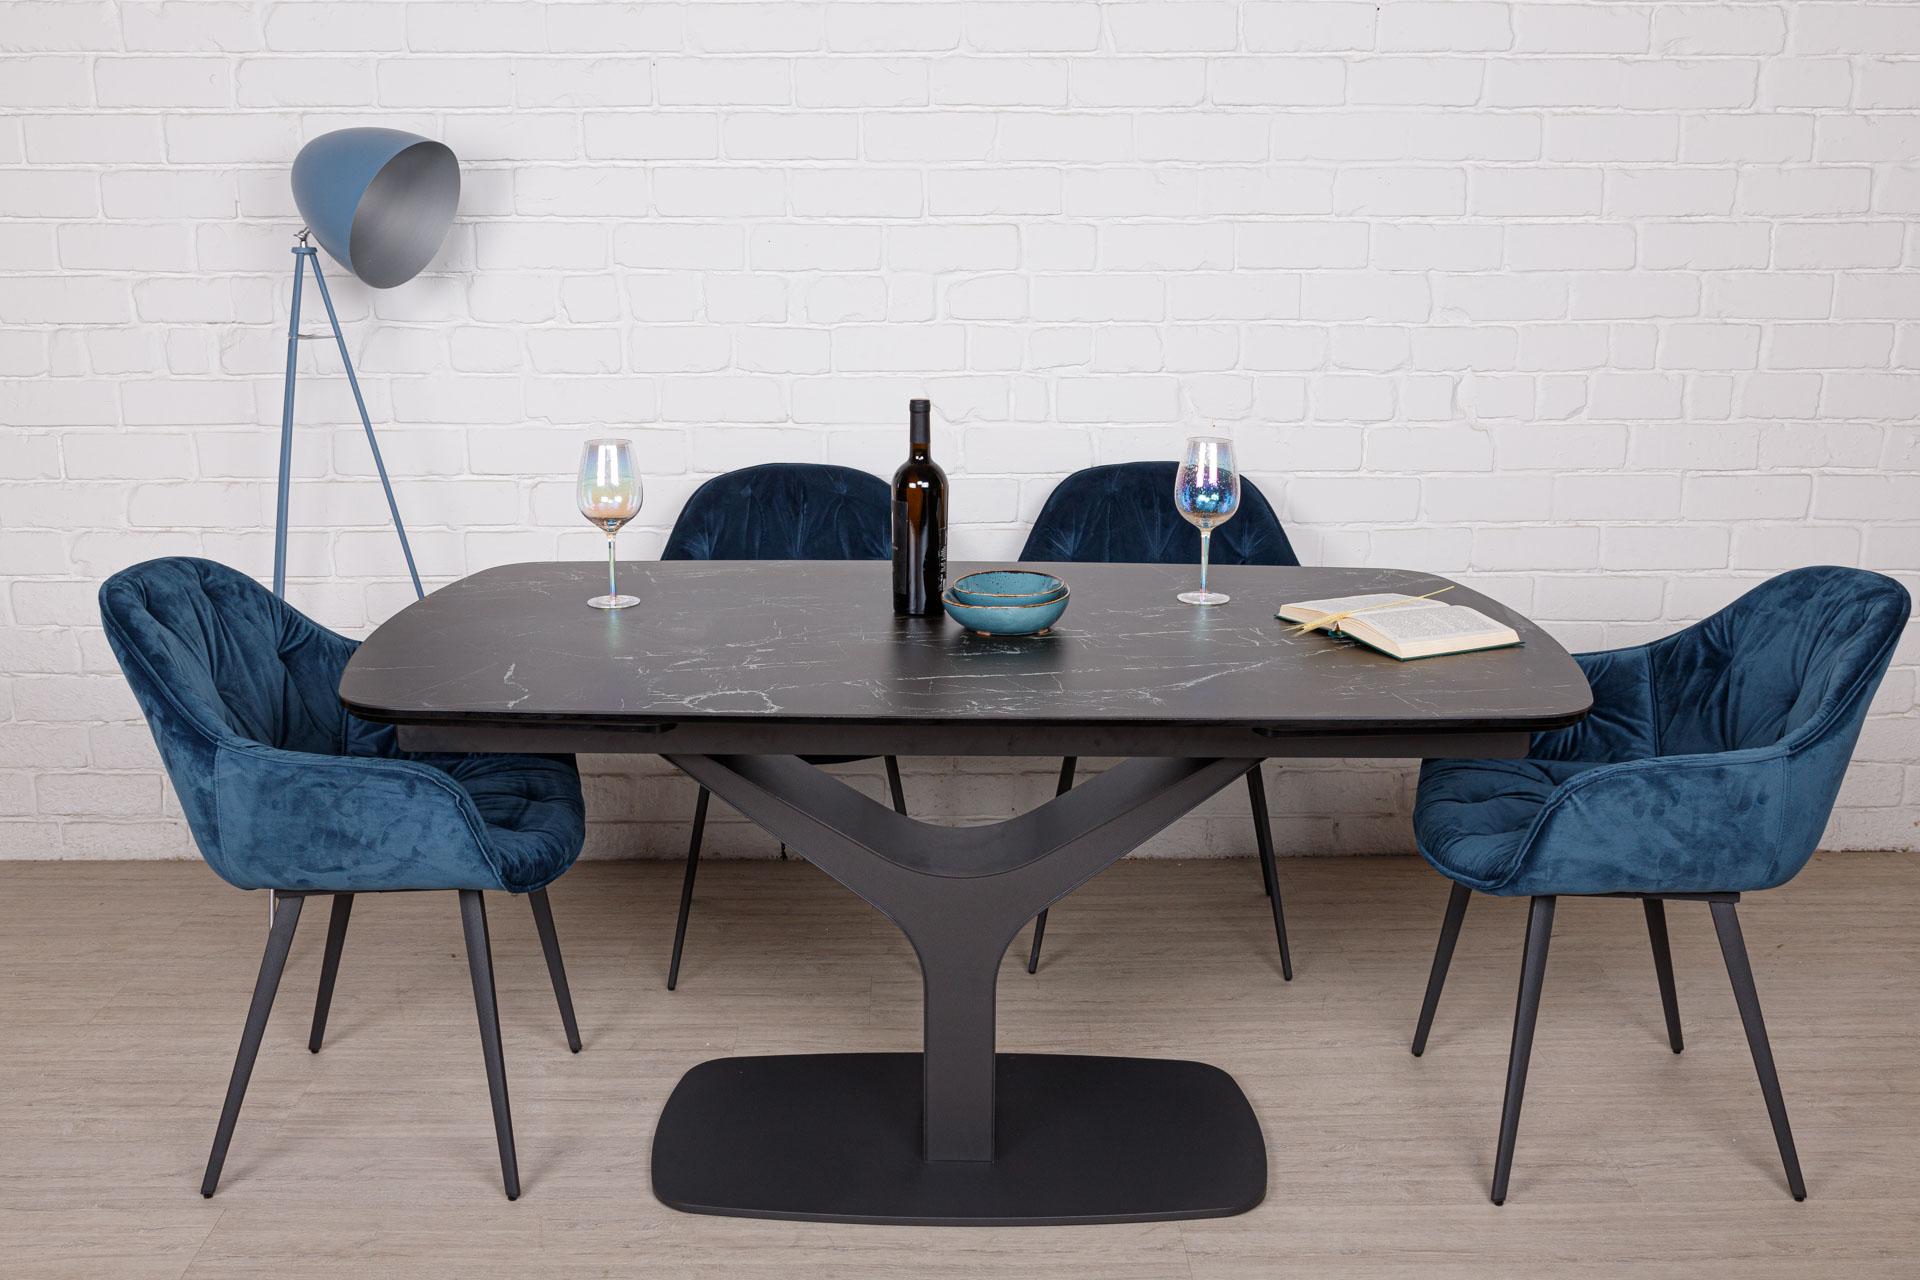 Стол Nicolas Vulcan oval HT92028 160 керамика черный